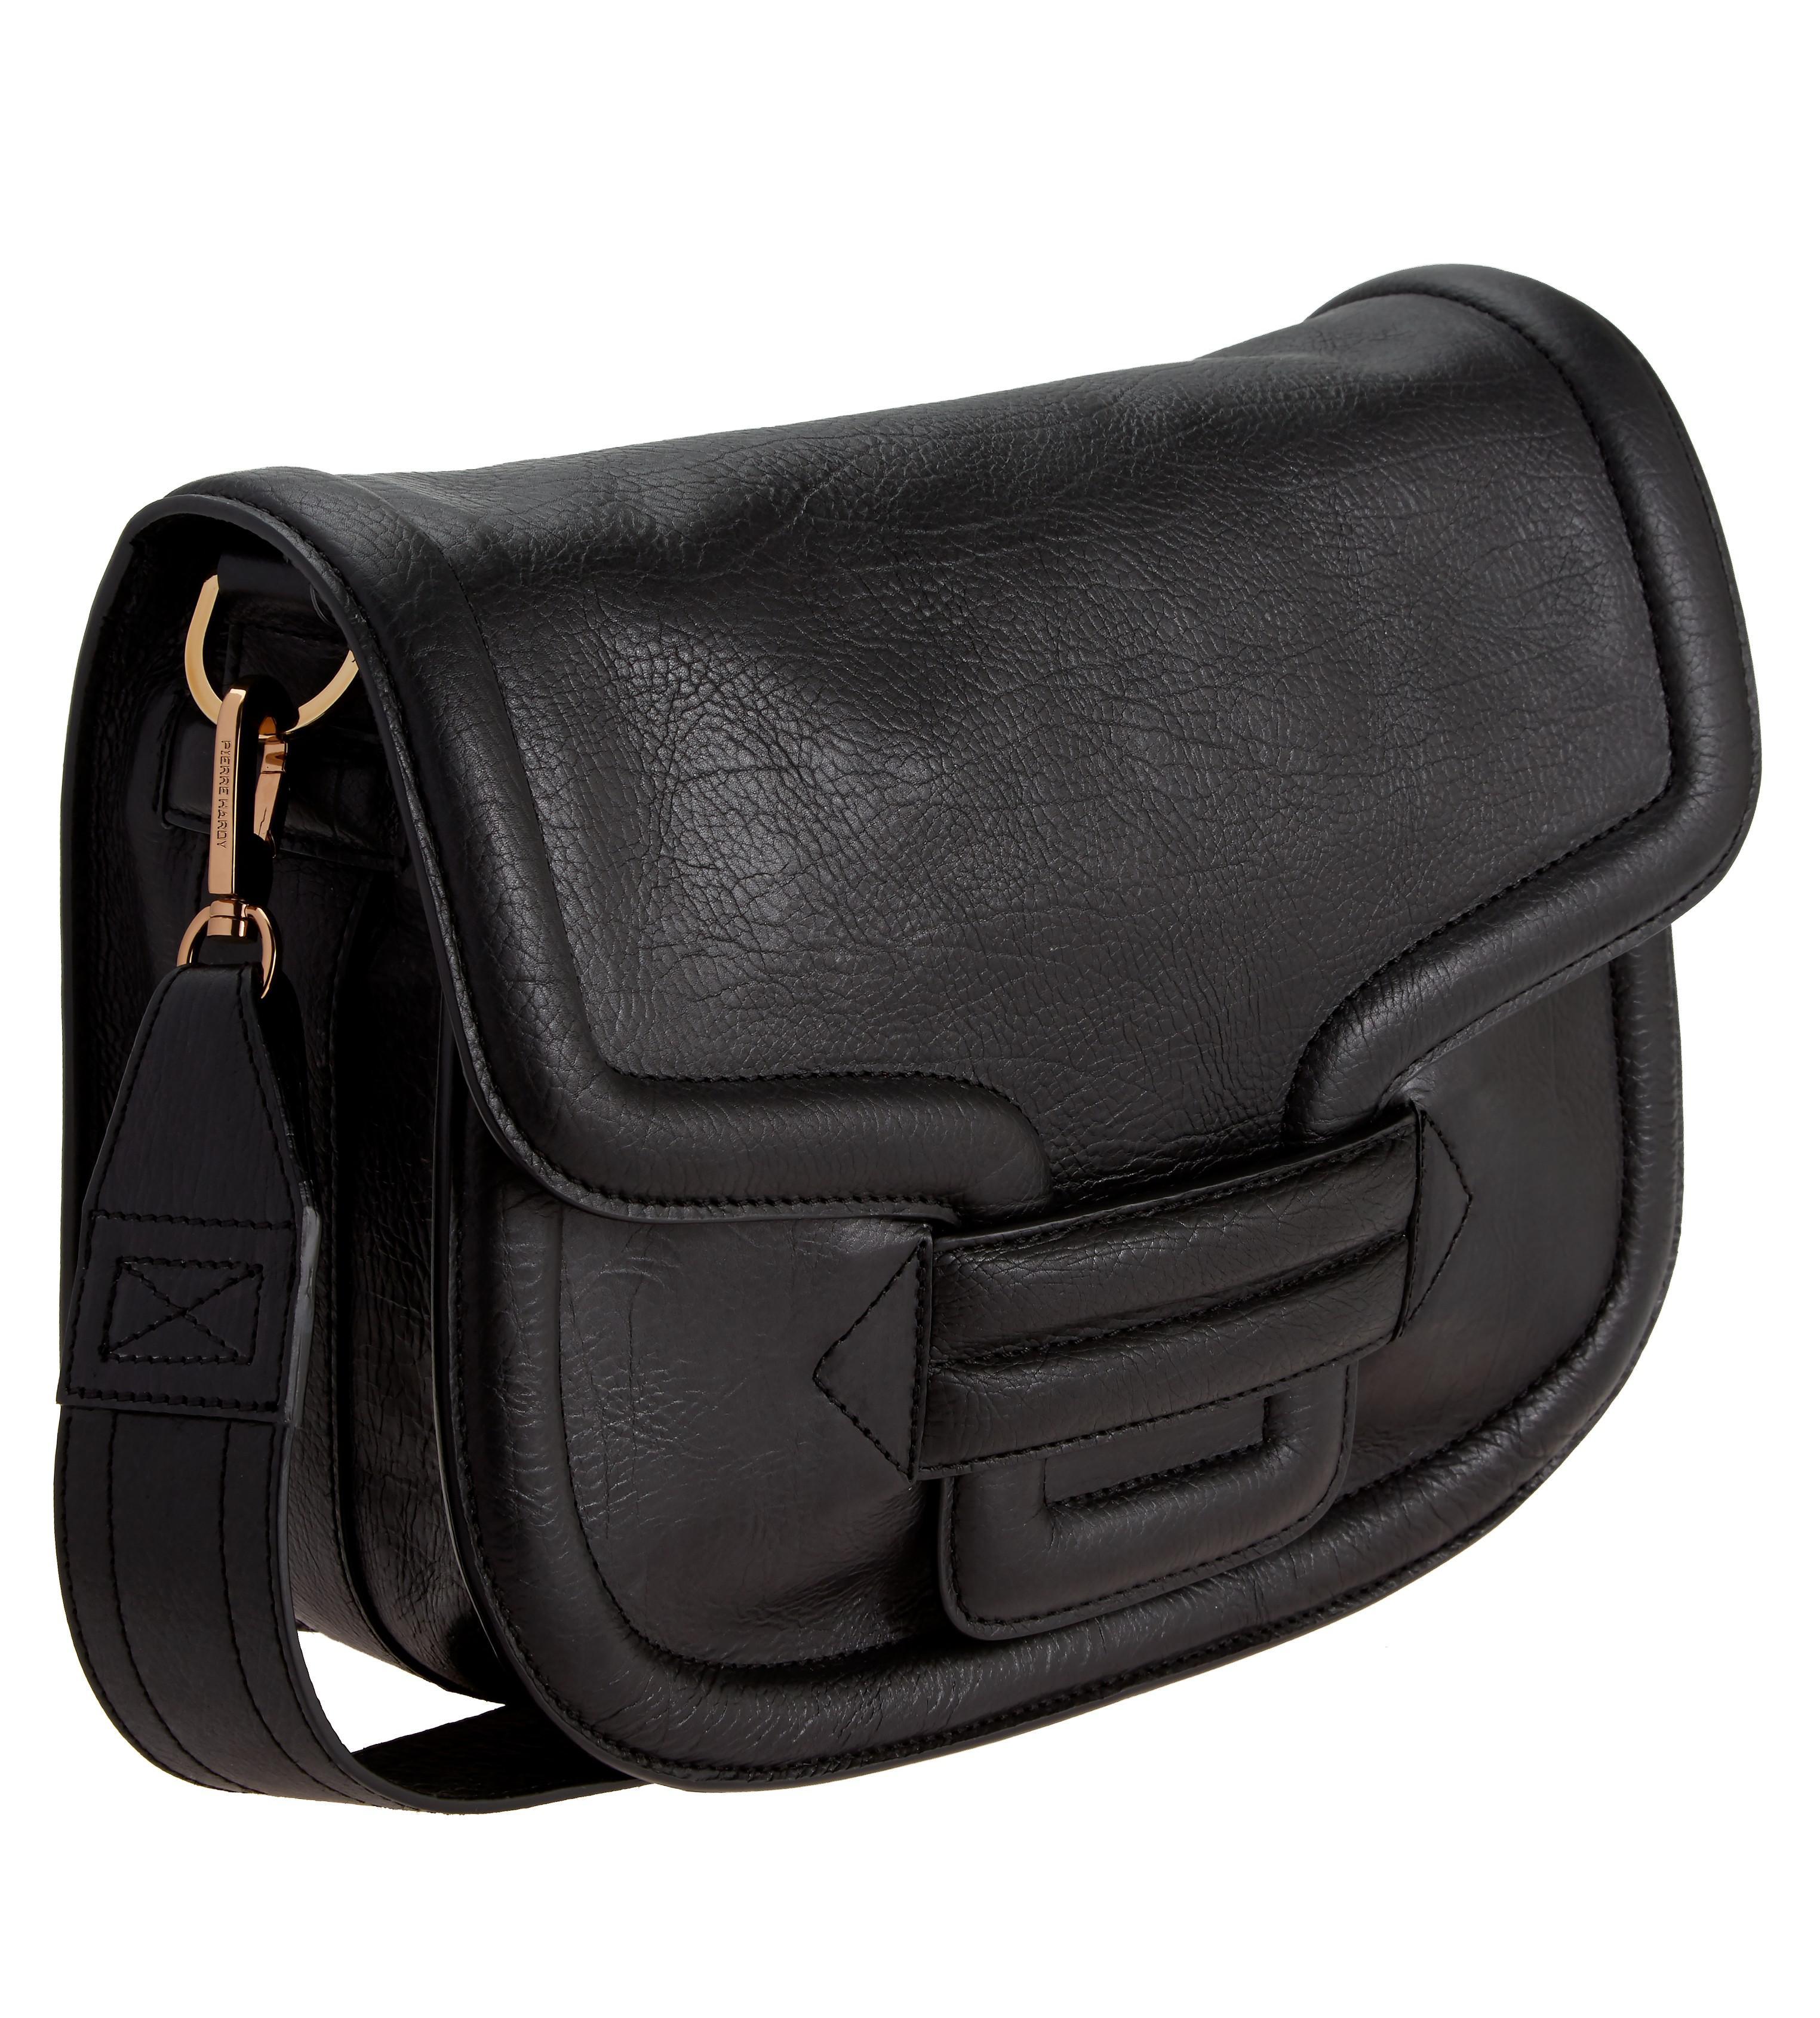 Mini Alpha Ville shoulder bag - Black Pierre Hardy m6eXA